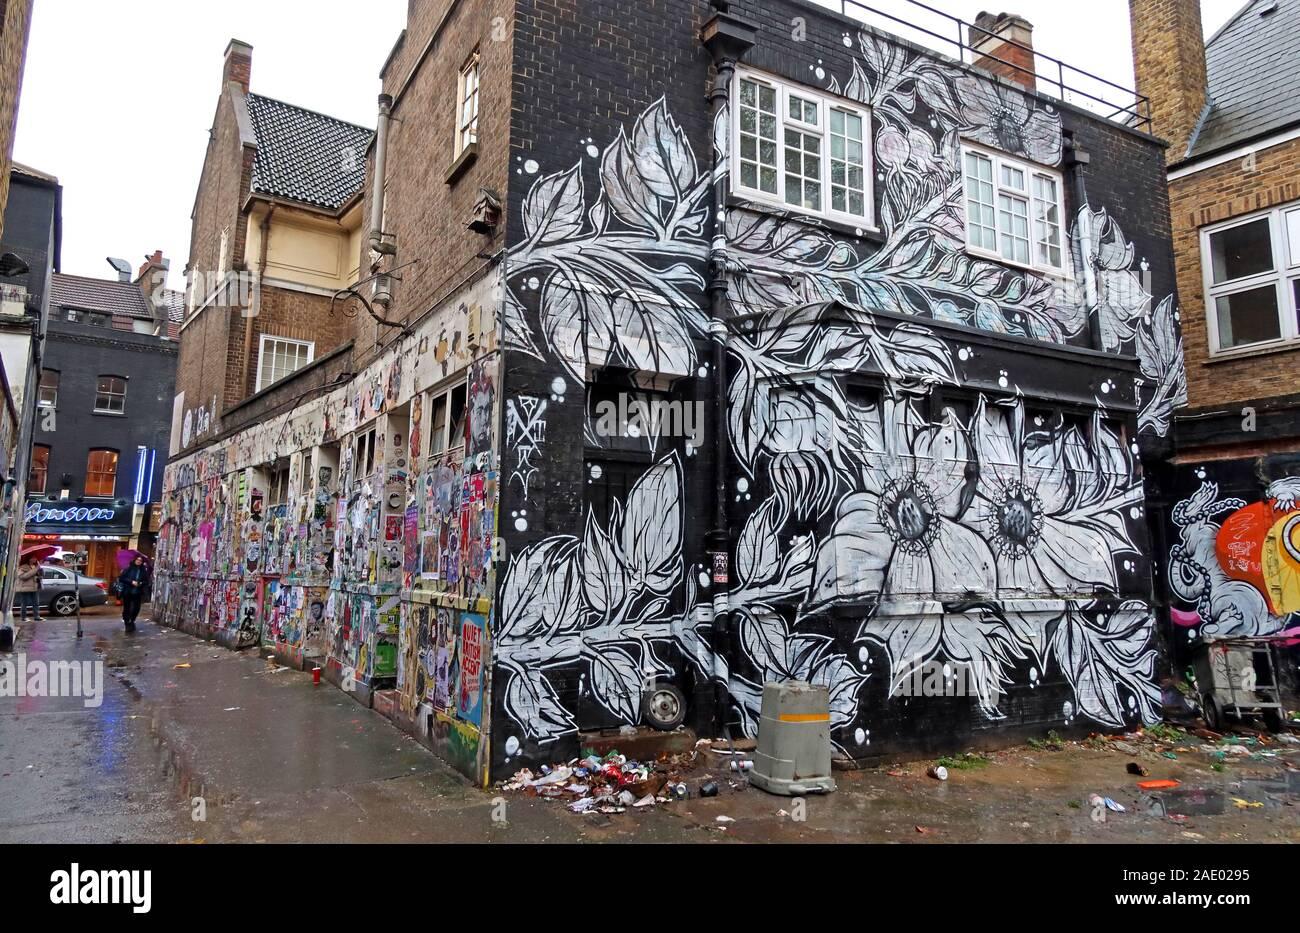 Dieses Stockfoto: Old Pub, 78 Brick Lane, Kunst und Graffiti, Shoreditch, Tower Hamlets, East End, London, South East, England, Großbritannien, E1 6QL - 2AE029